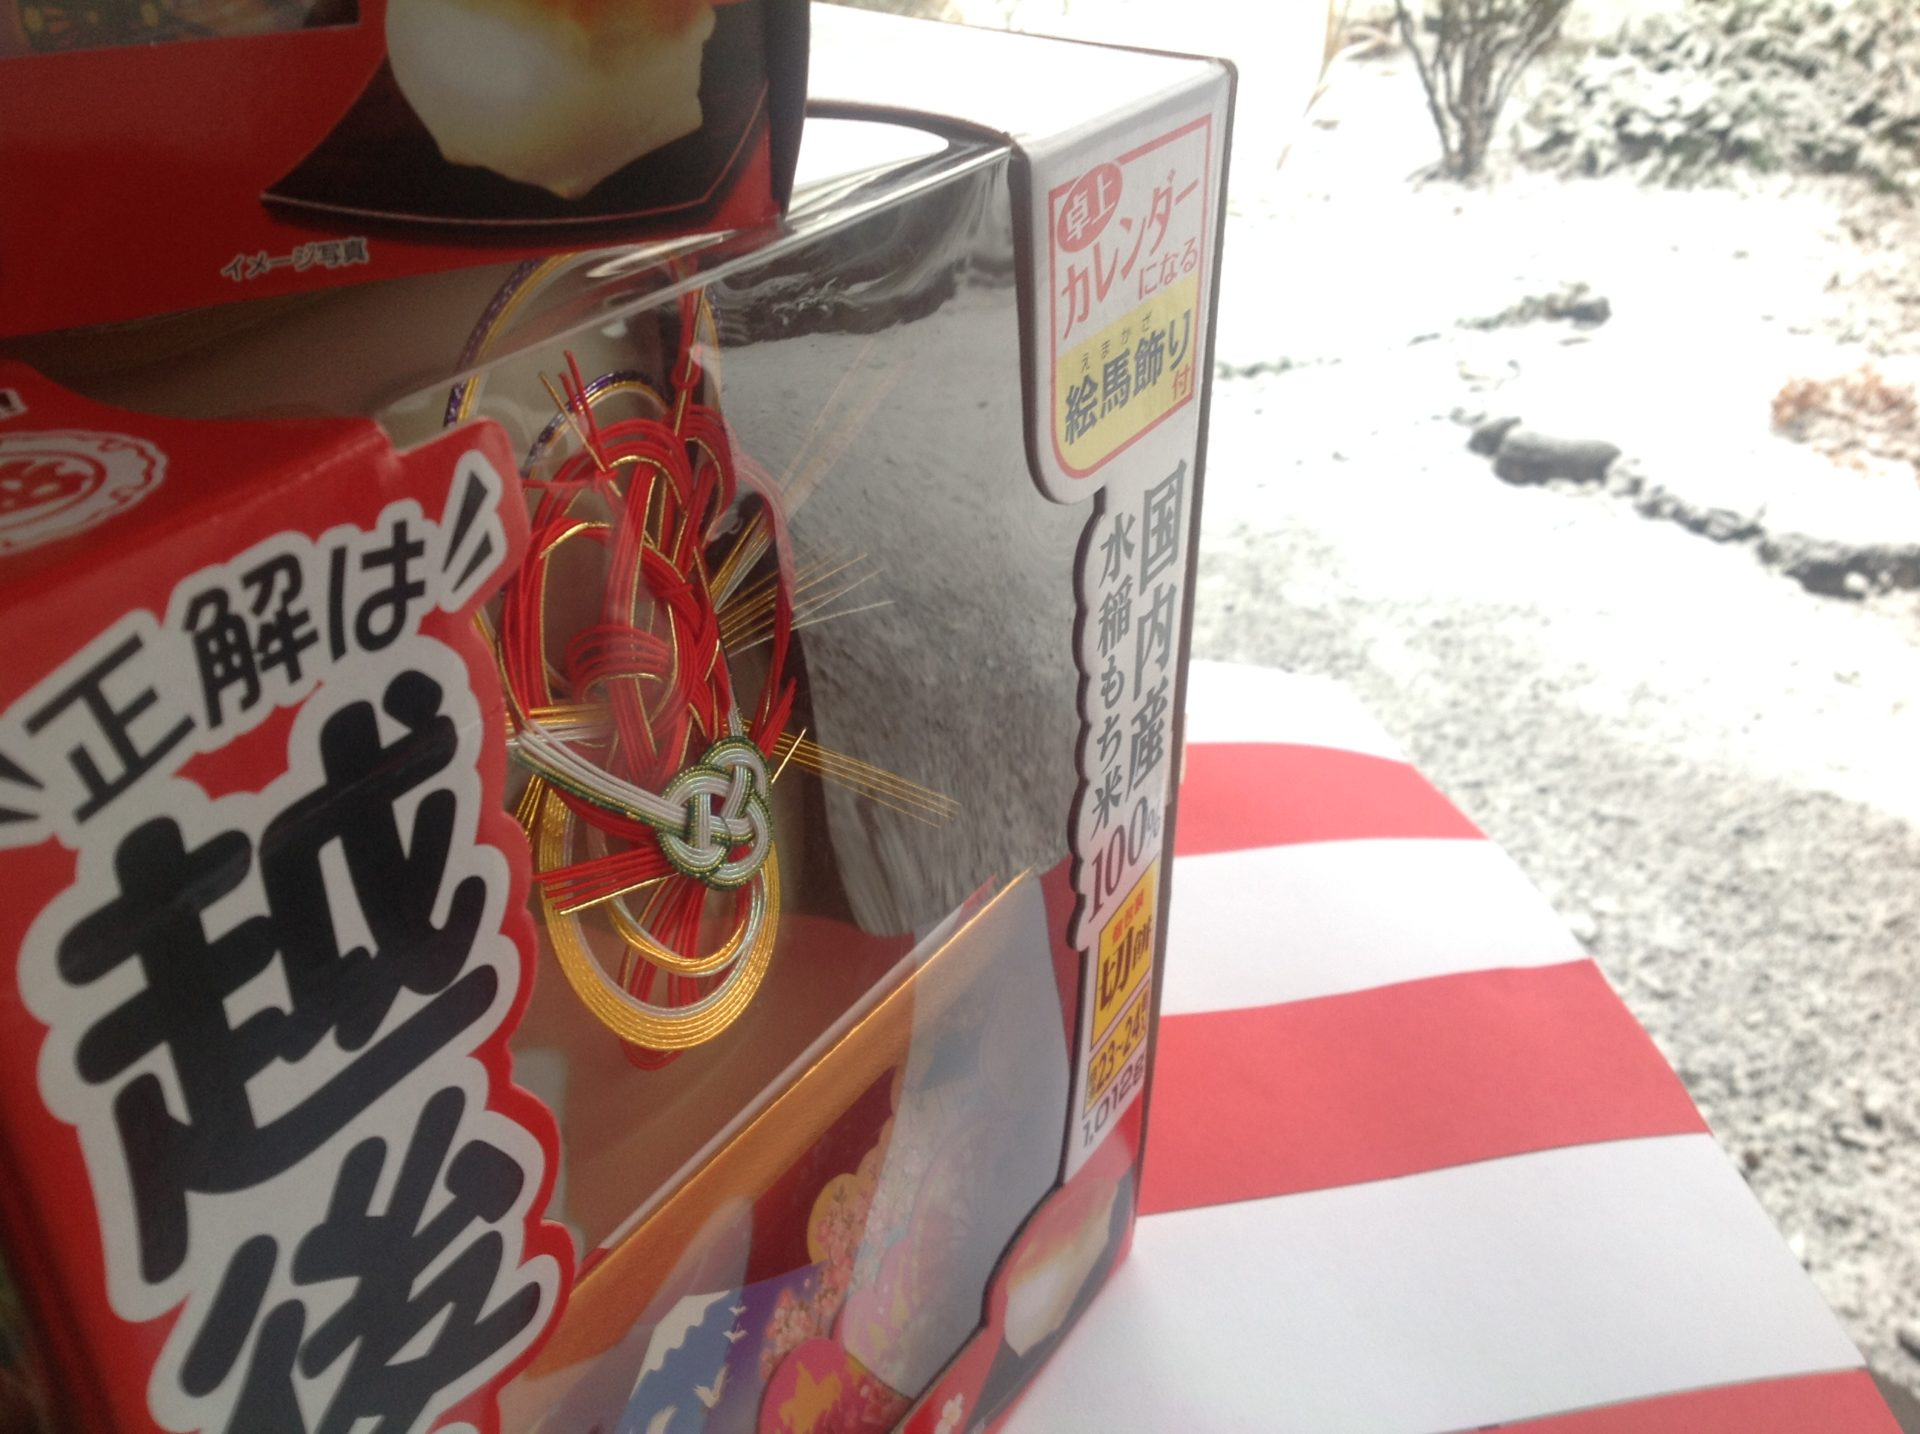 【Photo】お正月イメージ写真素材(21)